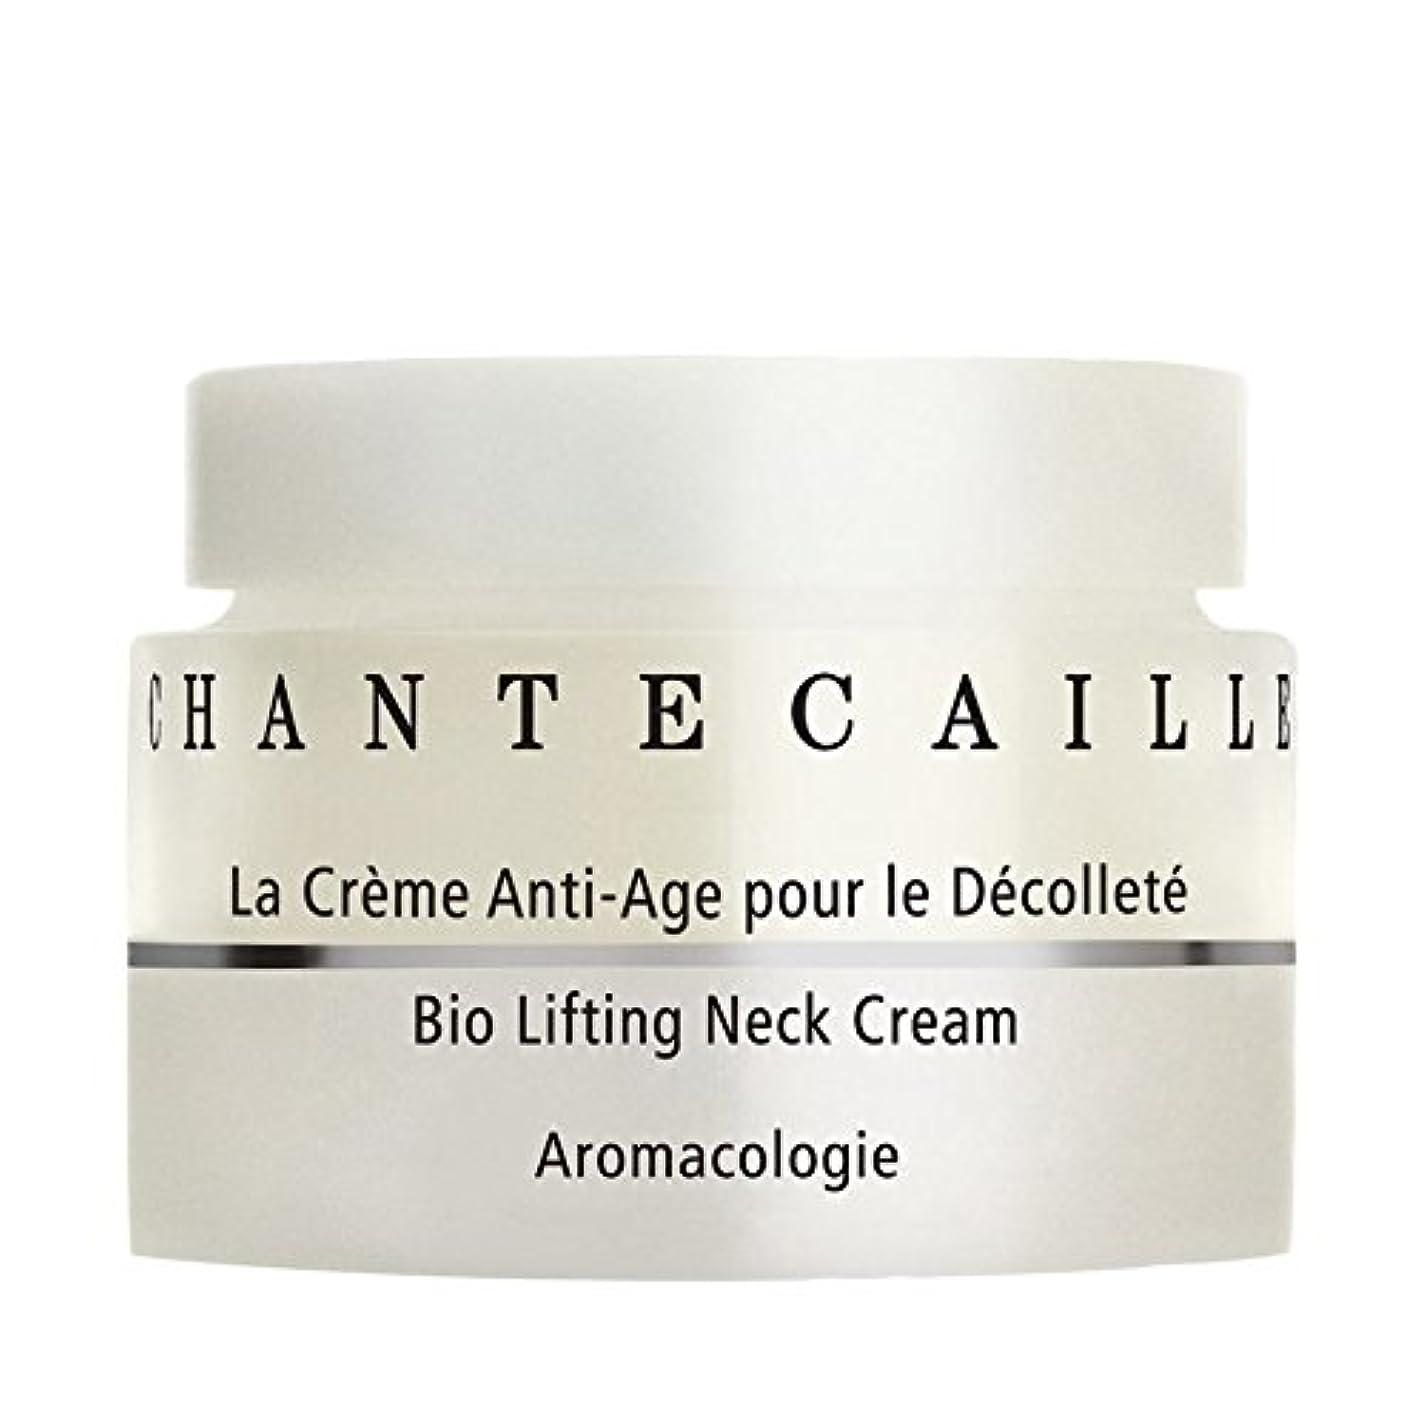 Chantecaille Biodynamic Lifting Neck Cream, Chantecaille - シャンテカイユバイオダイナミックリフティングネッククリーム、シャンテカイユ [並行輸入品]